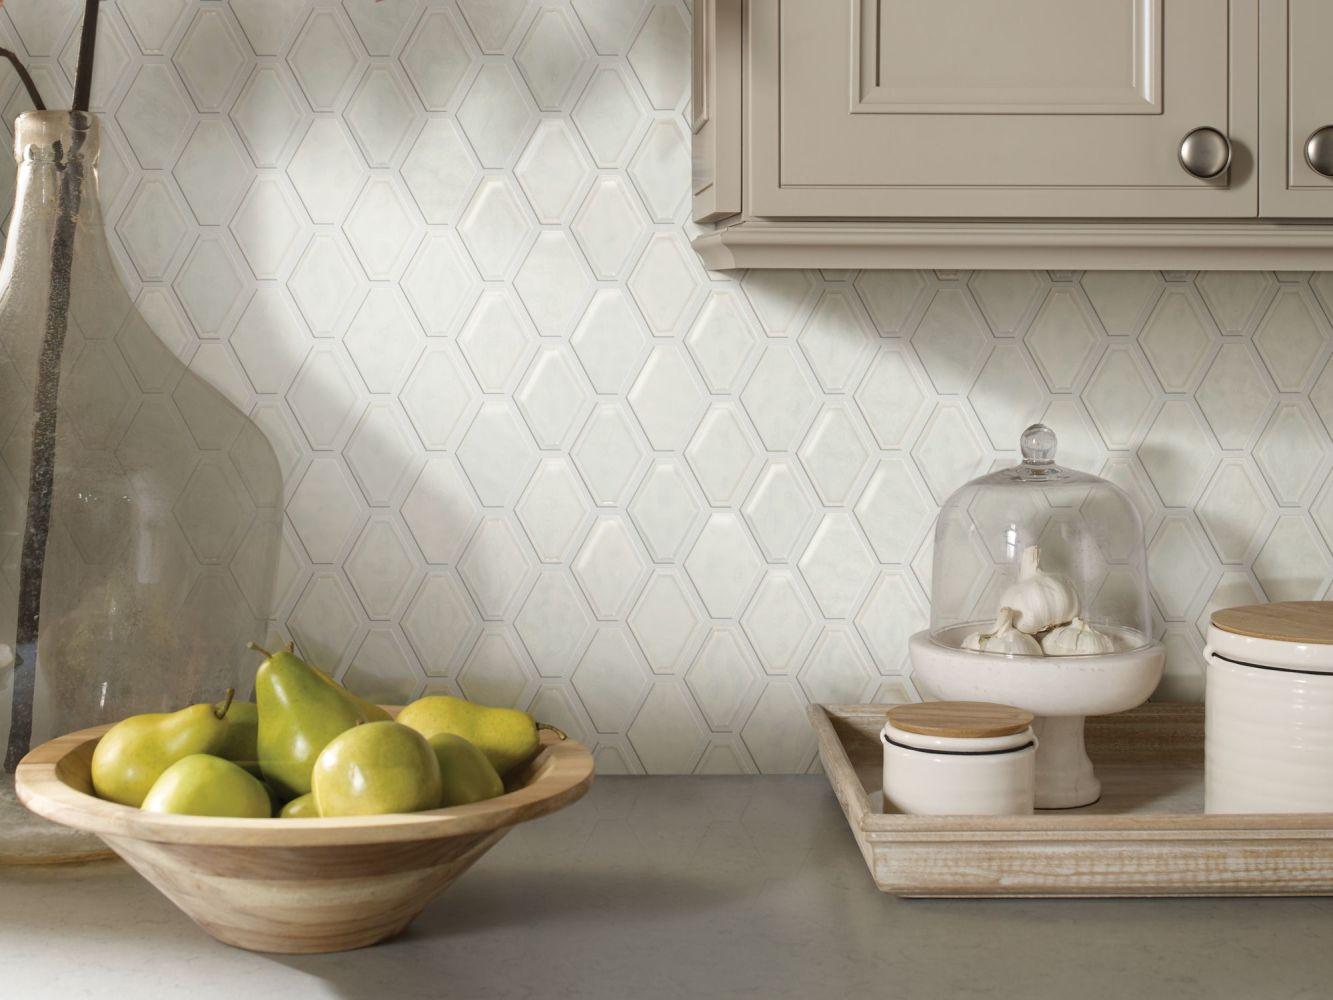 Shaw Floors Home Fn Gold Ceramic Geoscapes Diamond Bone 00150_TGJ79